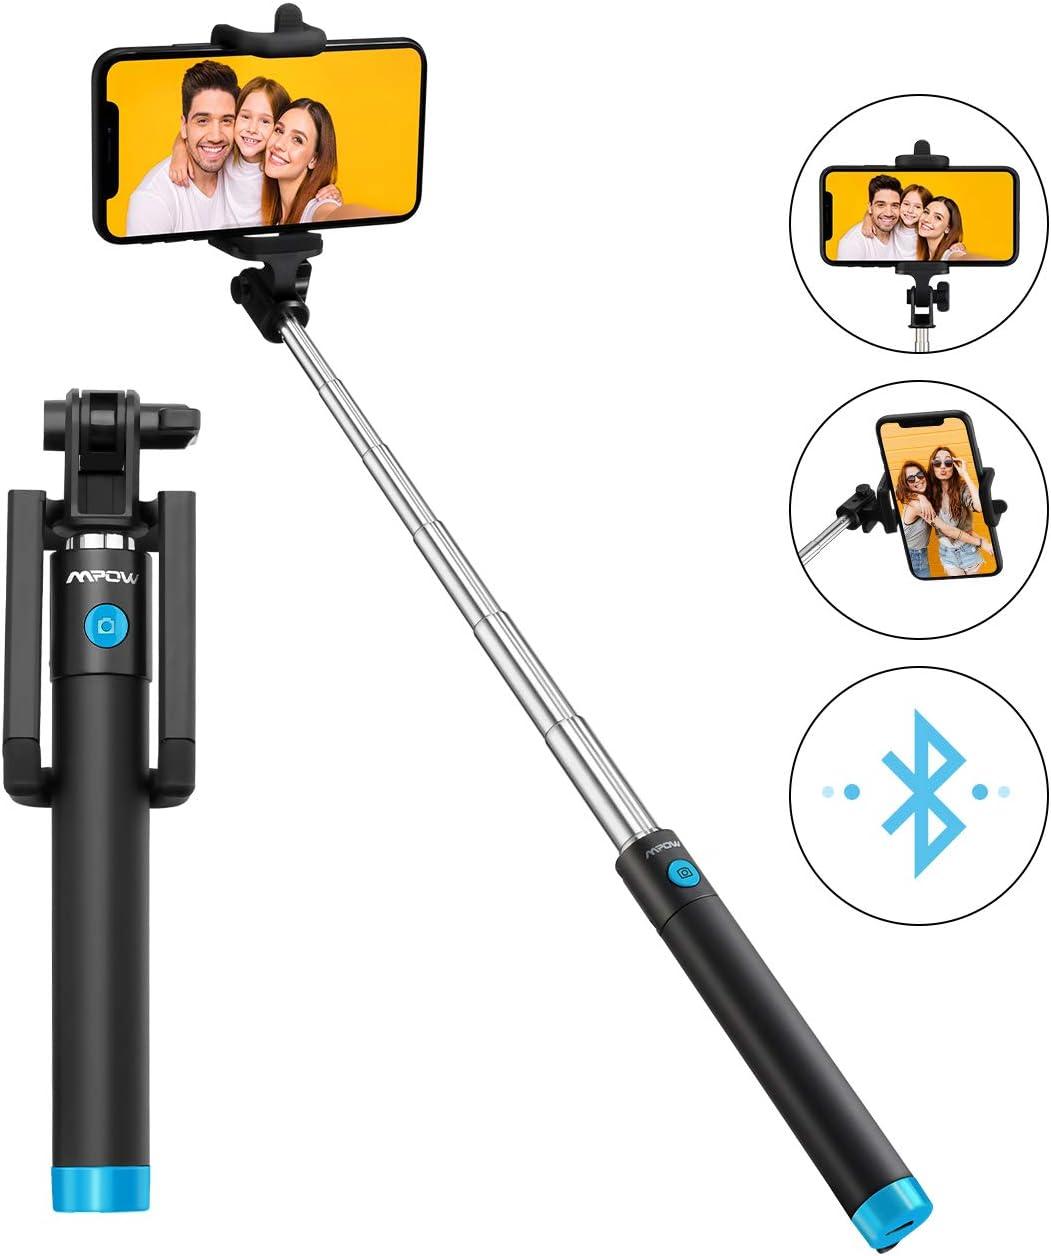 Mpow Palo Selfie Movil, Selfie Stick Bluetooth Diseño ligero, inalámbrico palo selfie con Bluetooth Remoto Compatible iPhone 11/11 Pro Max/XS Max /XR/X/8/7/ 6, Galaxy S10/S9/S8, Huawei Xiaomi etc